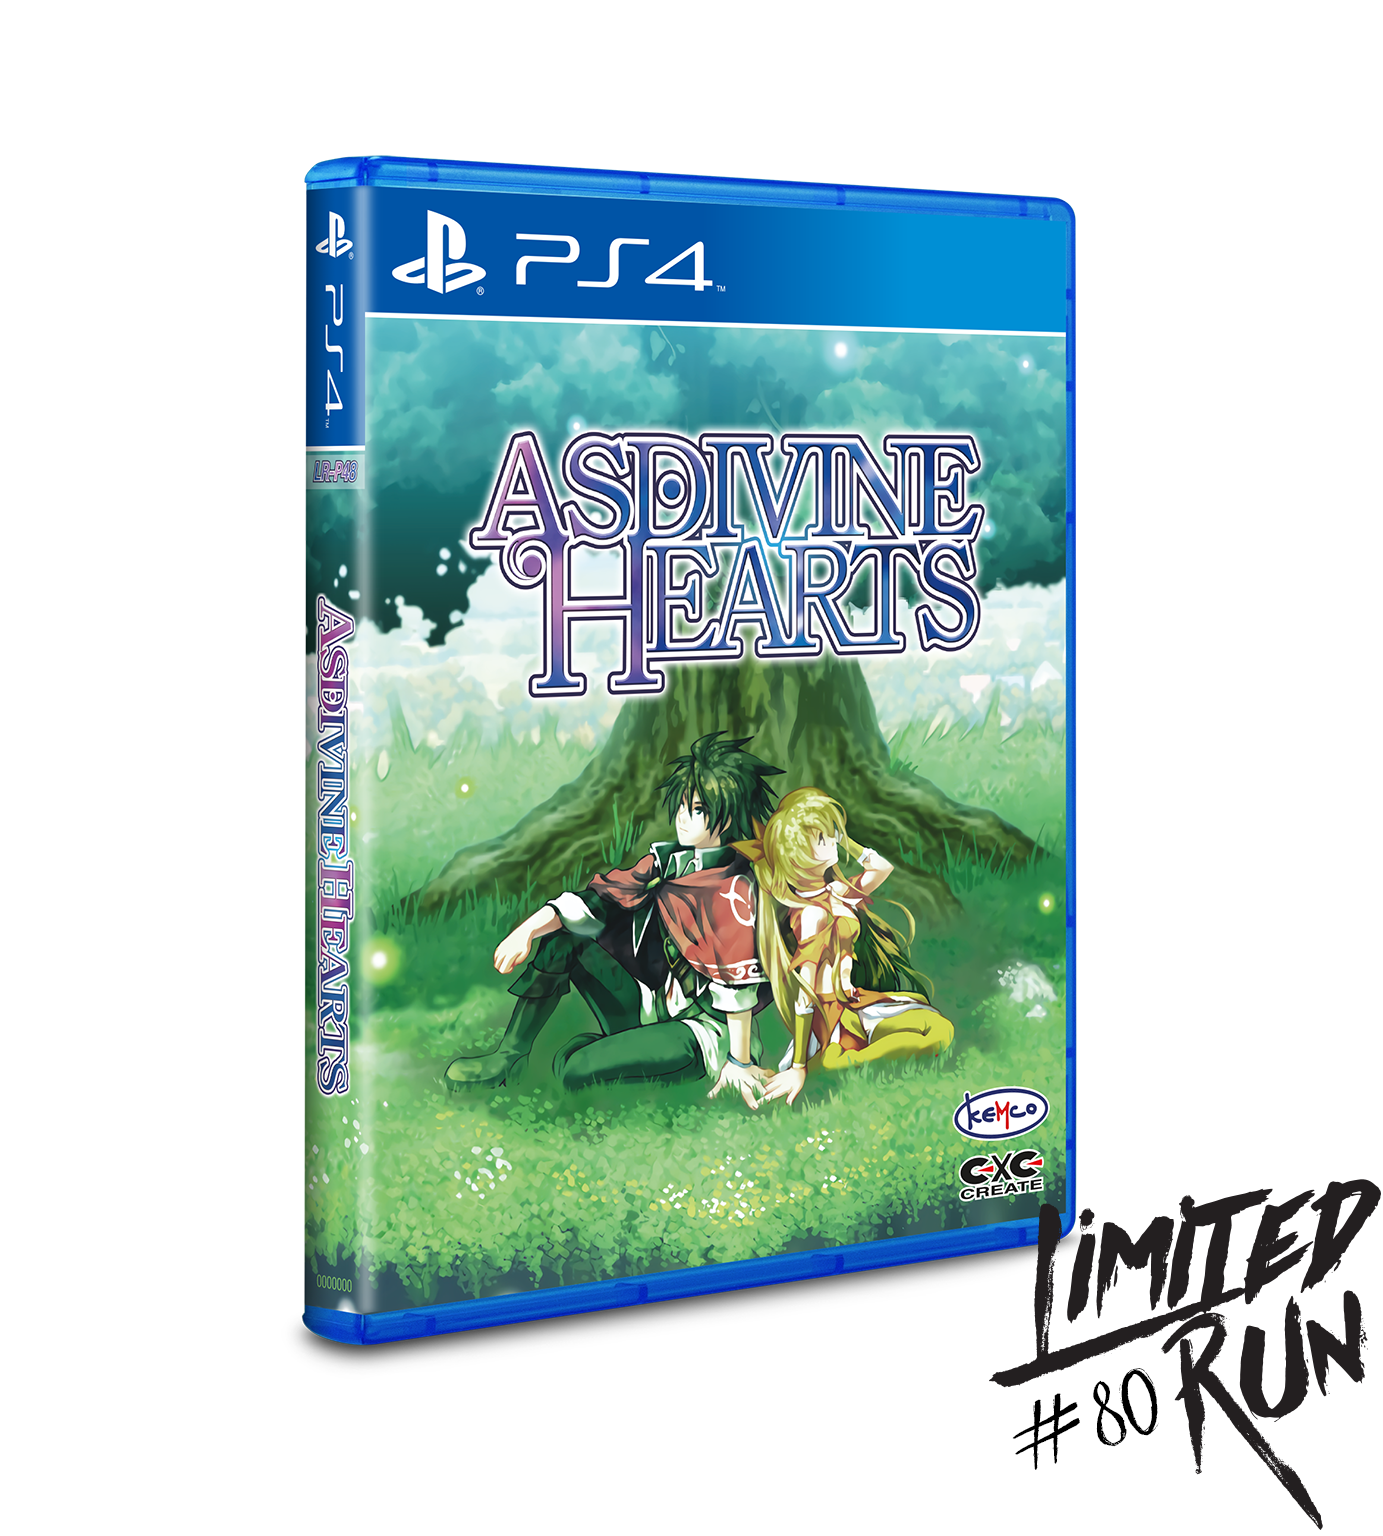 Asdivine Hearts Limited Run 80 PlayStation 4 Ps4